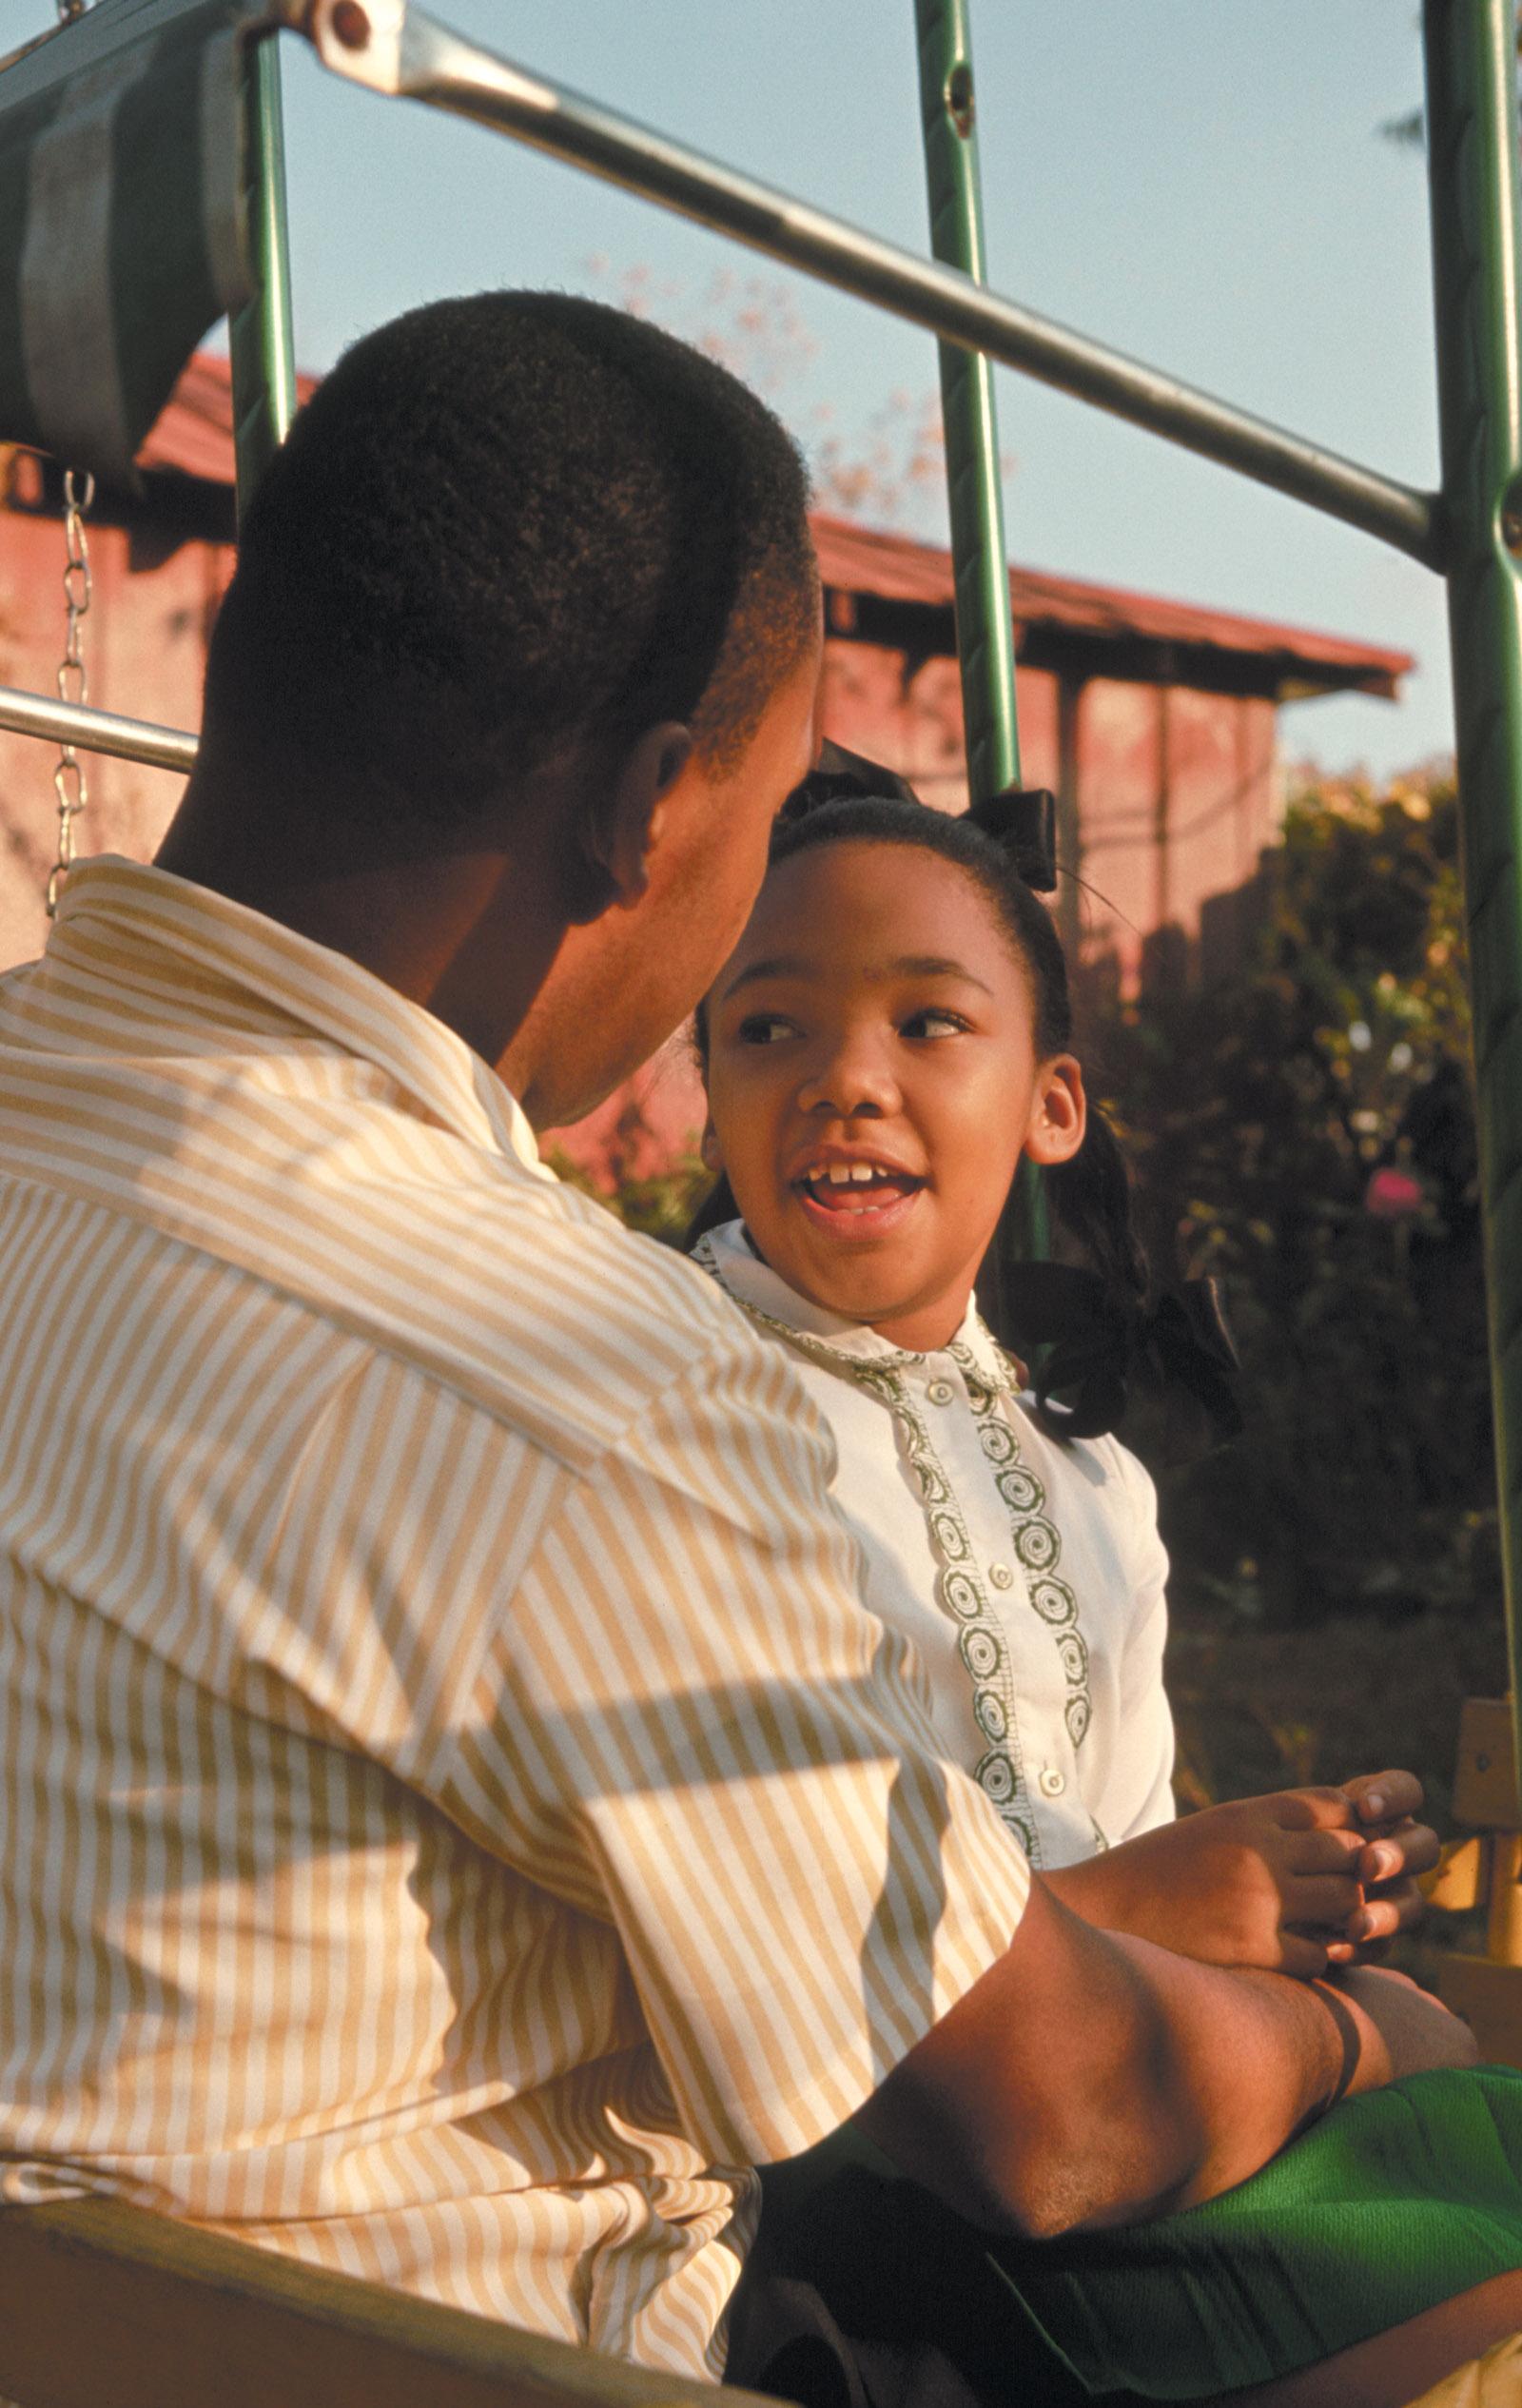 Martin Luther King Jr. with his daughter Yolanda in their backyard, Atlanta, 1964